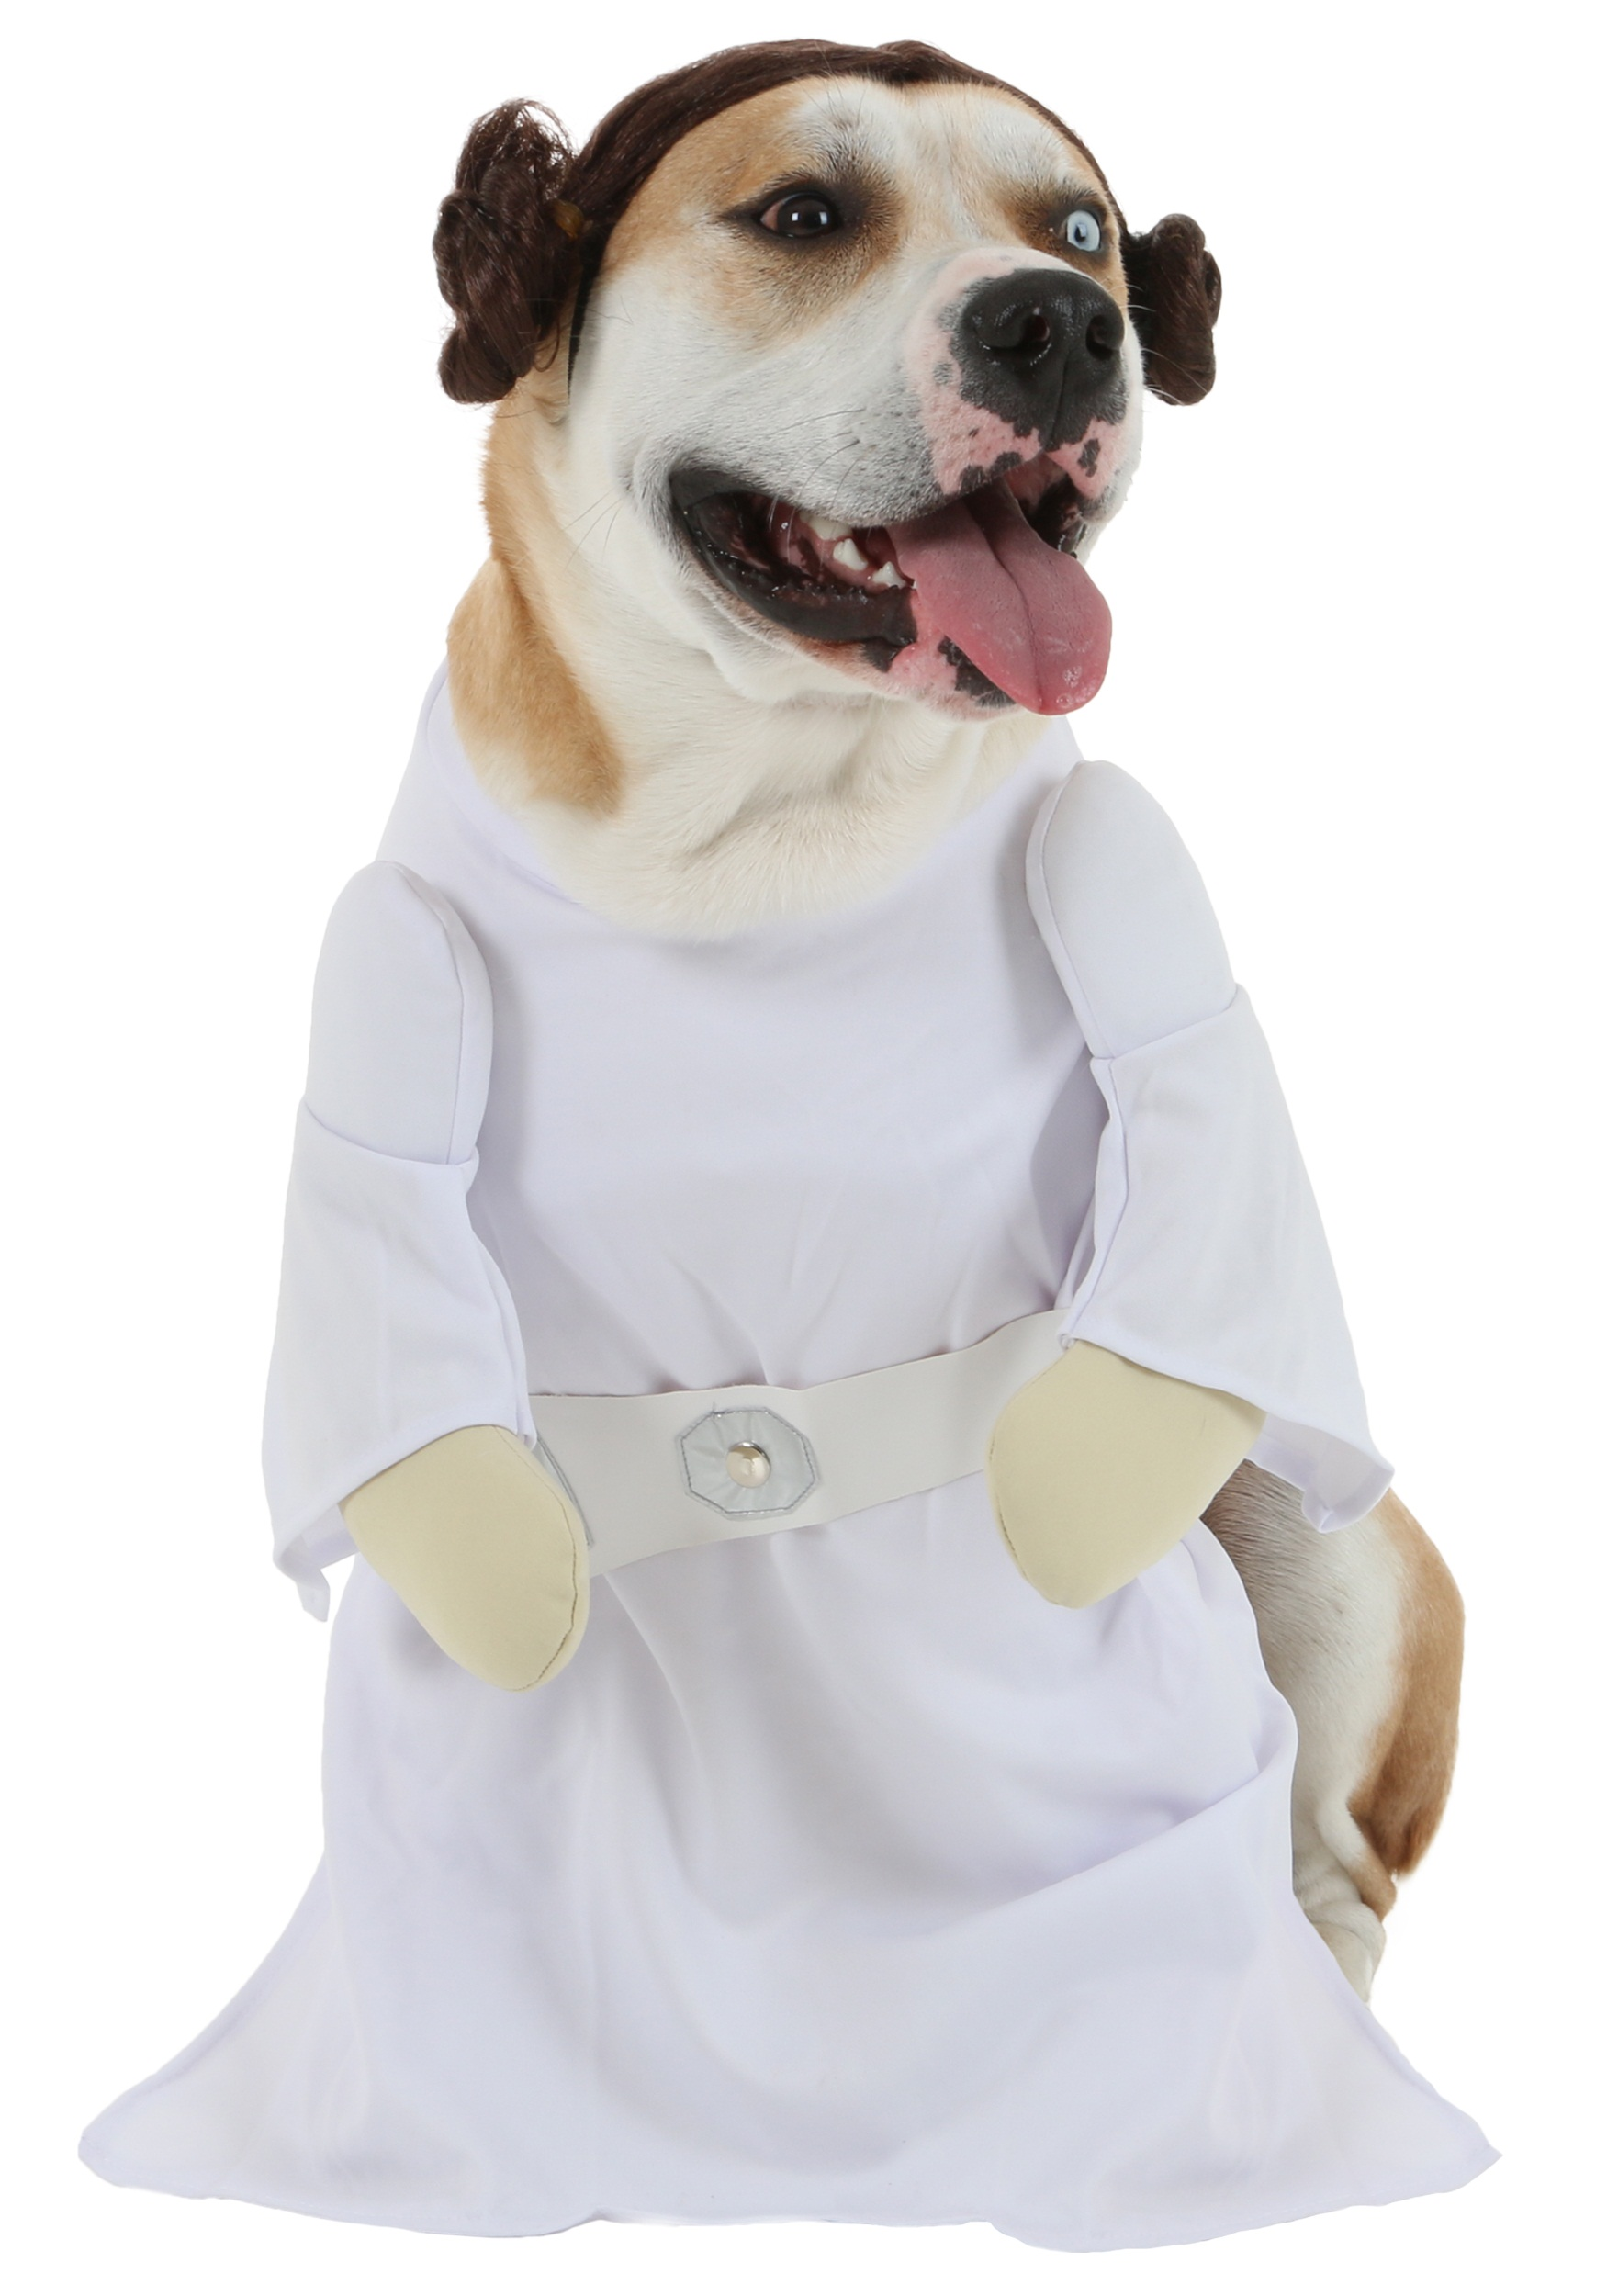 Princess Leia Dog Costume  sc 1 st  Buy Star Wars Costumes & Princess Leia Dog Costume - Star Wars Pet Dog Costume